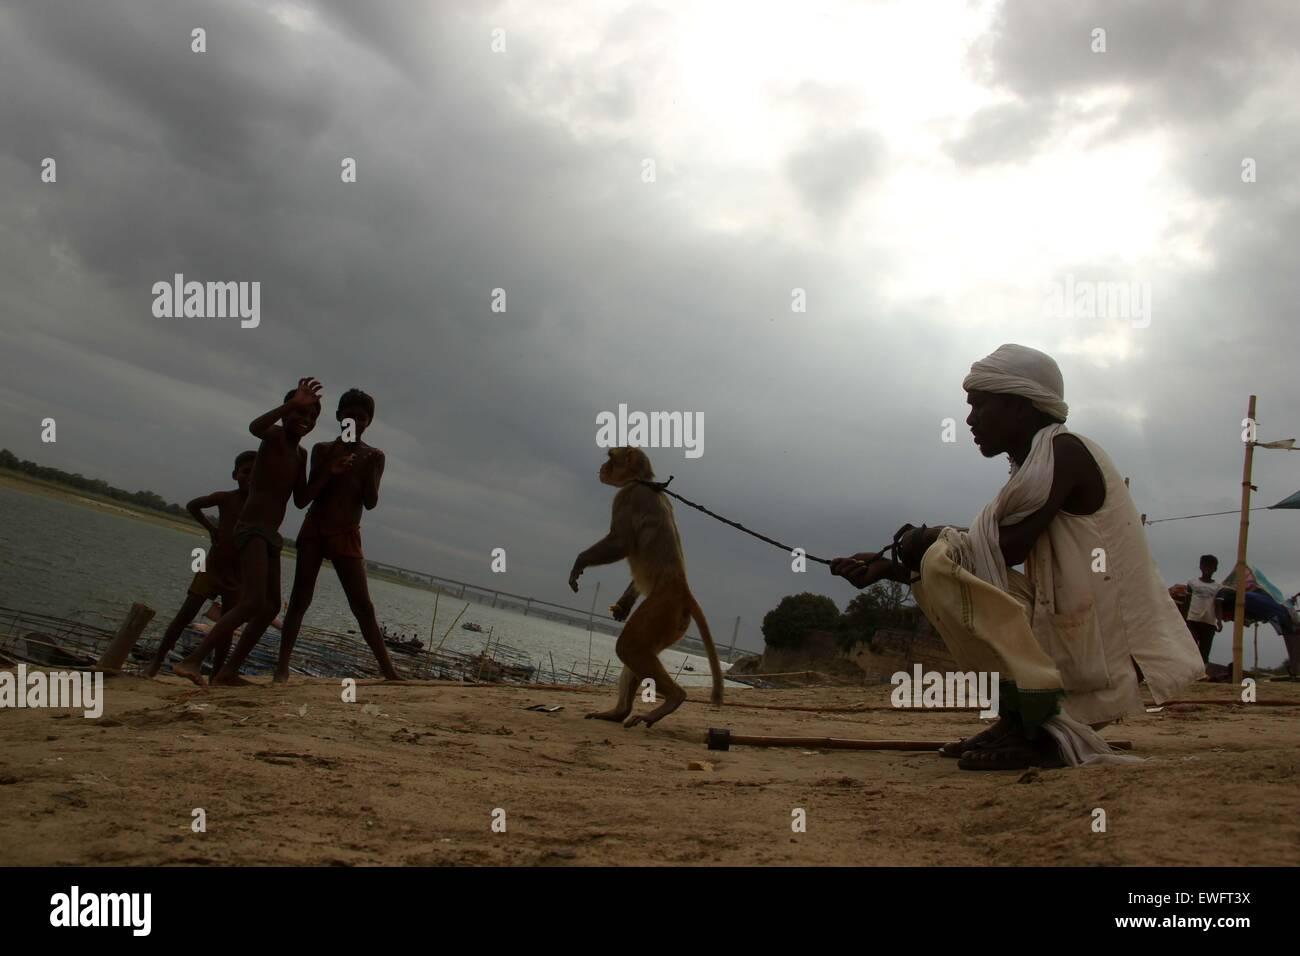 hot season in india